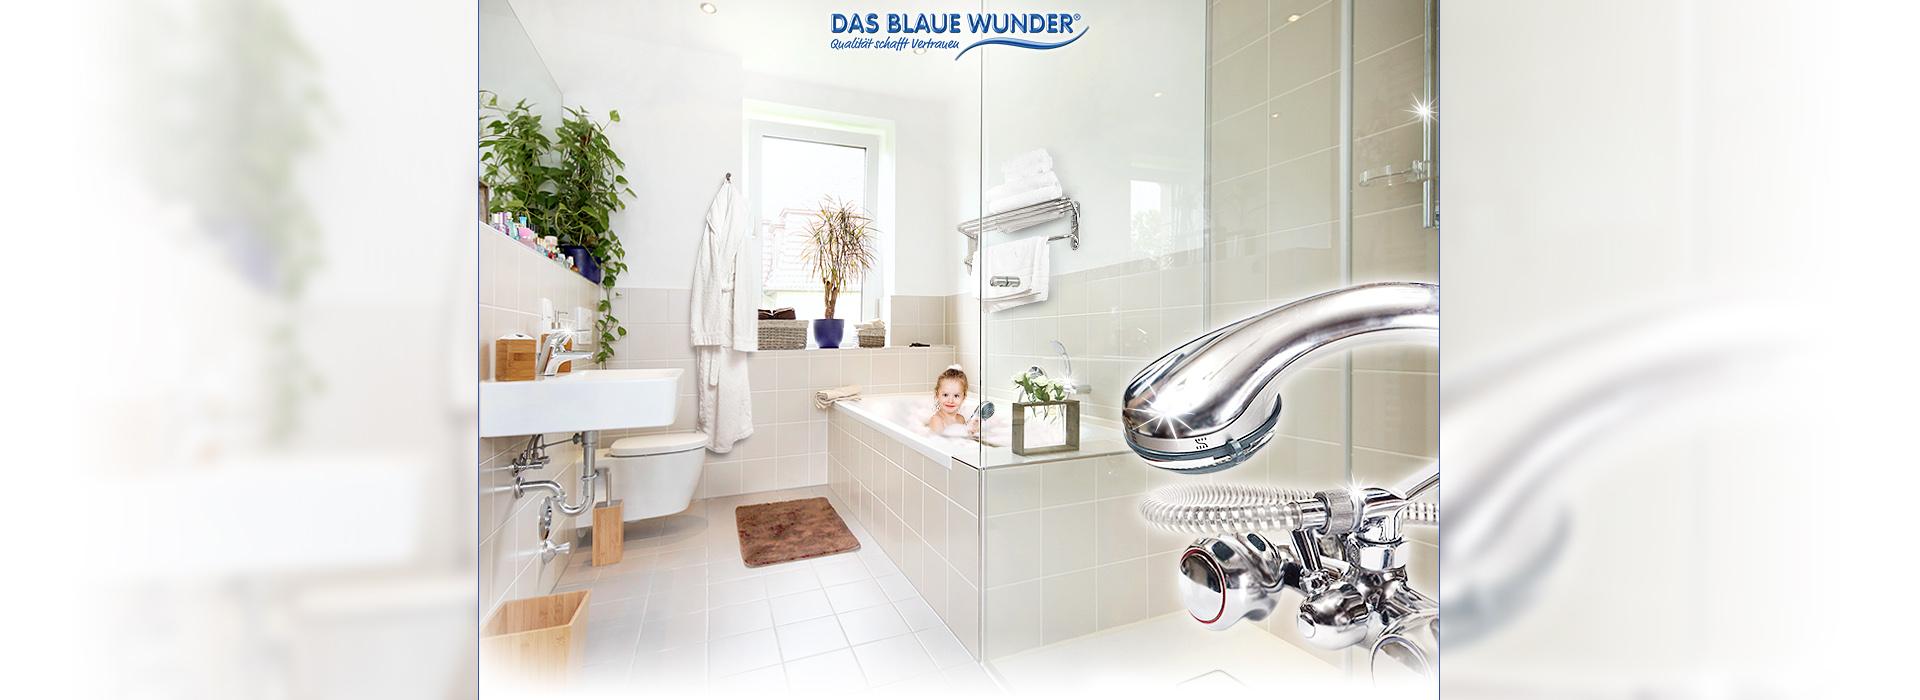 Badezimmer Putzen. Fabulous Medium Size Of Badezimmer Fliesen Braun ...